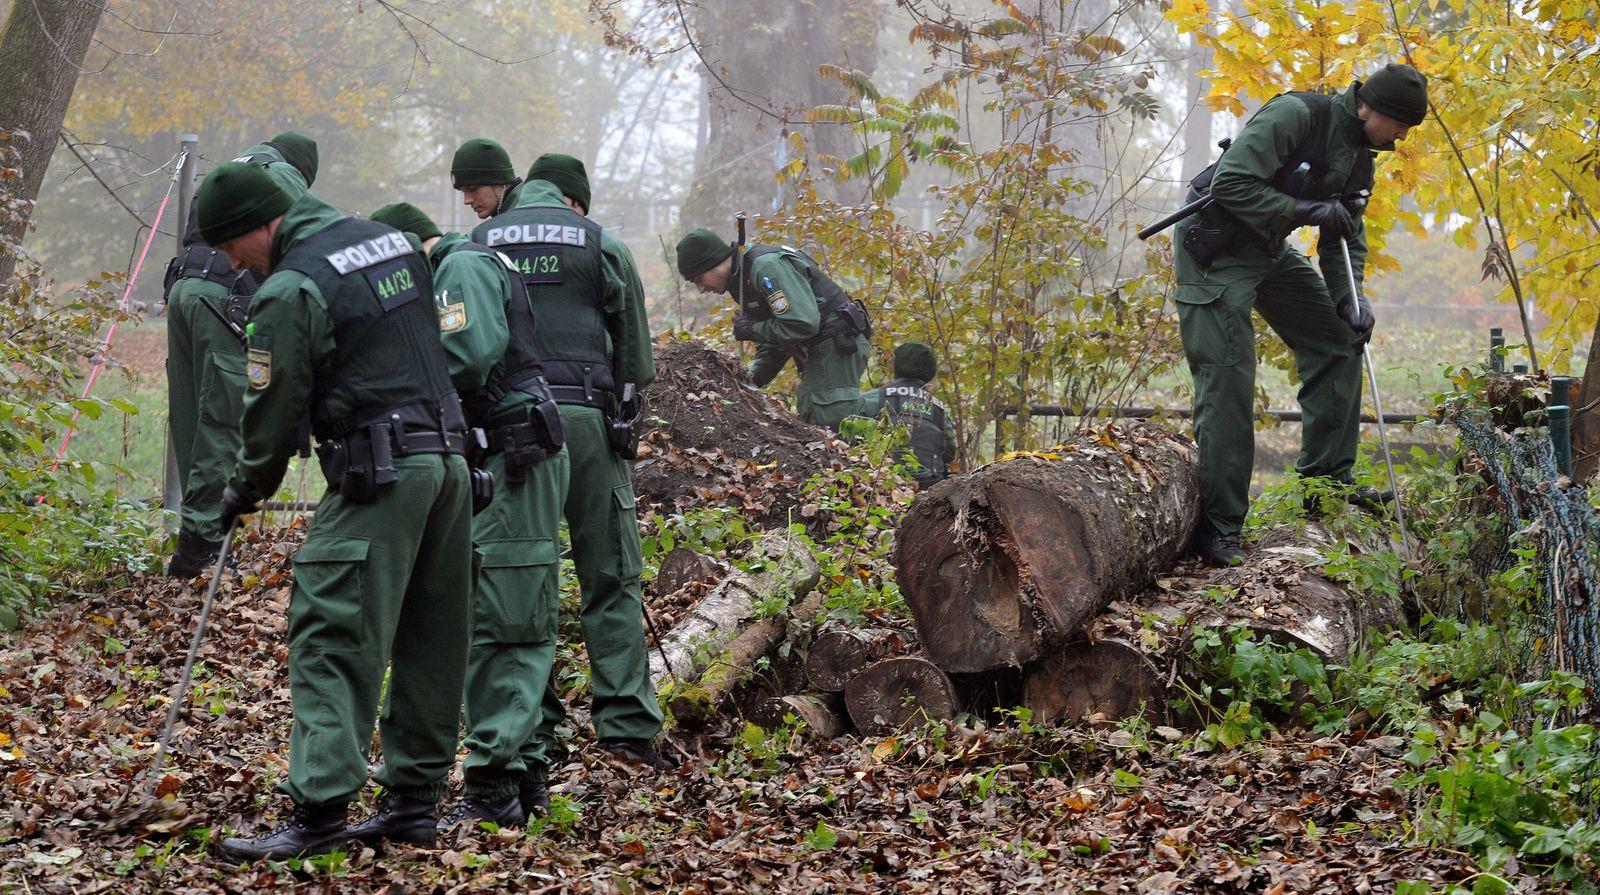 Augsburg/ Polizistenmord